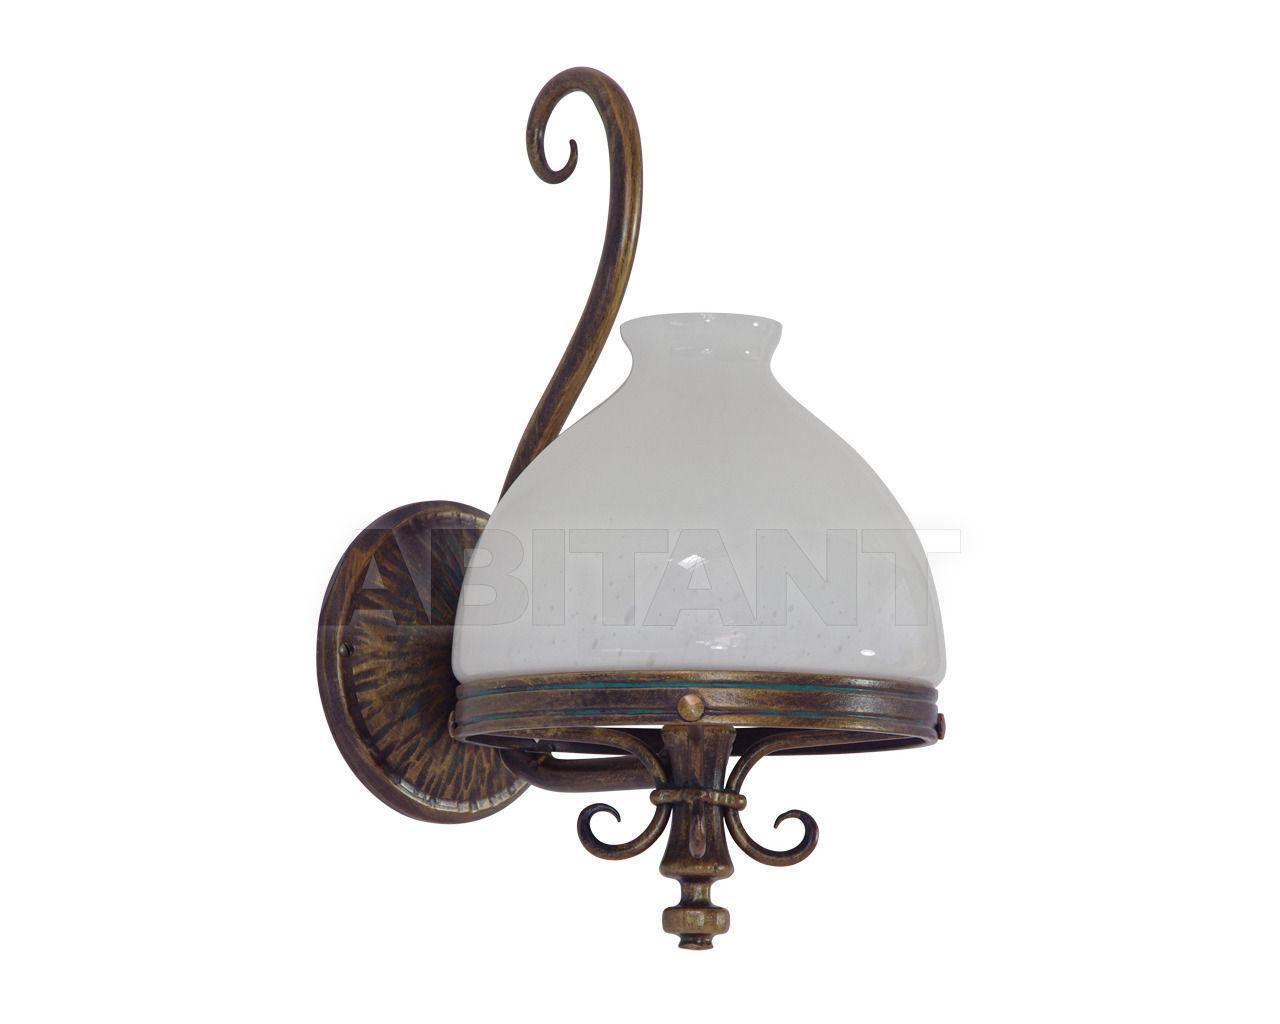 Купить Светильник настенный FMB Leuchten Schmiedeeisen Lampen Und Leuchten 94127